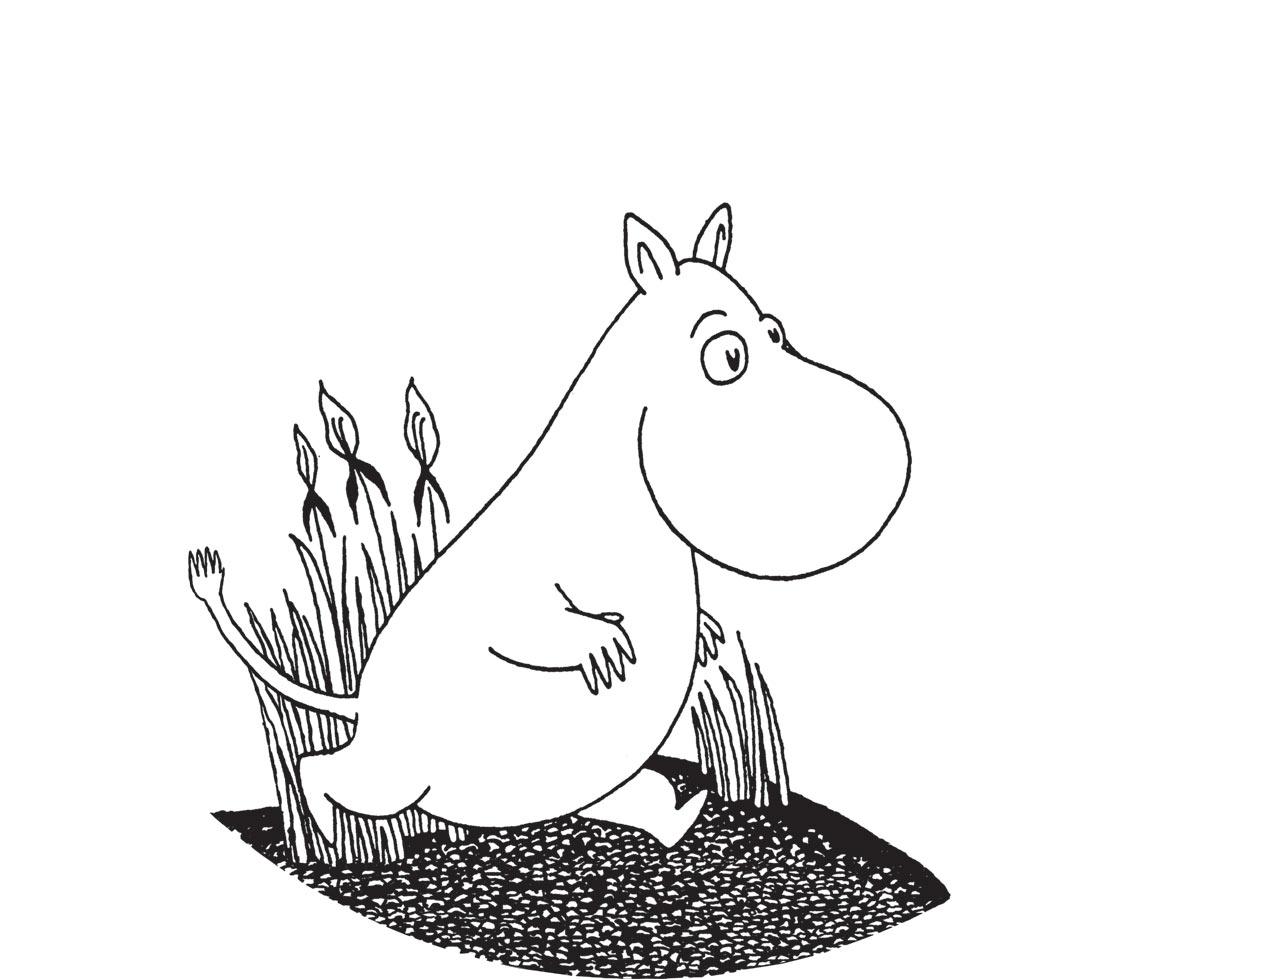 Artek_Moomin_collection-6-Artek_Moomintroll